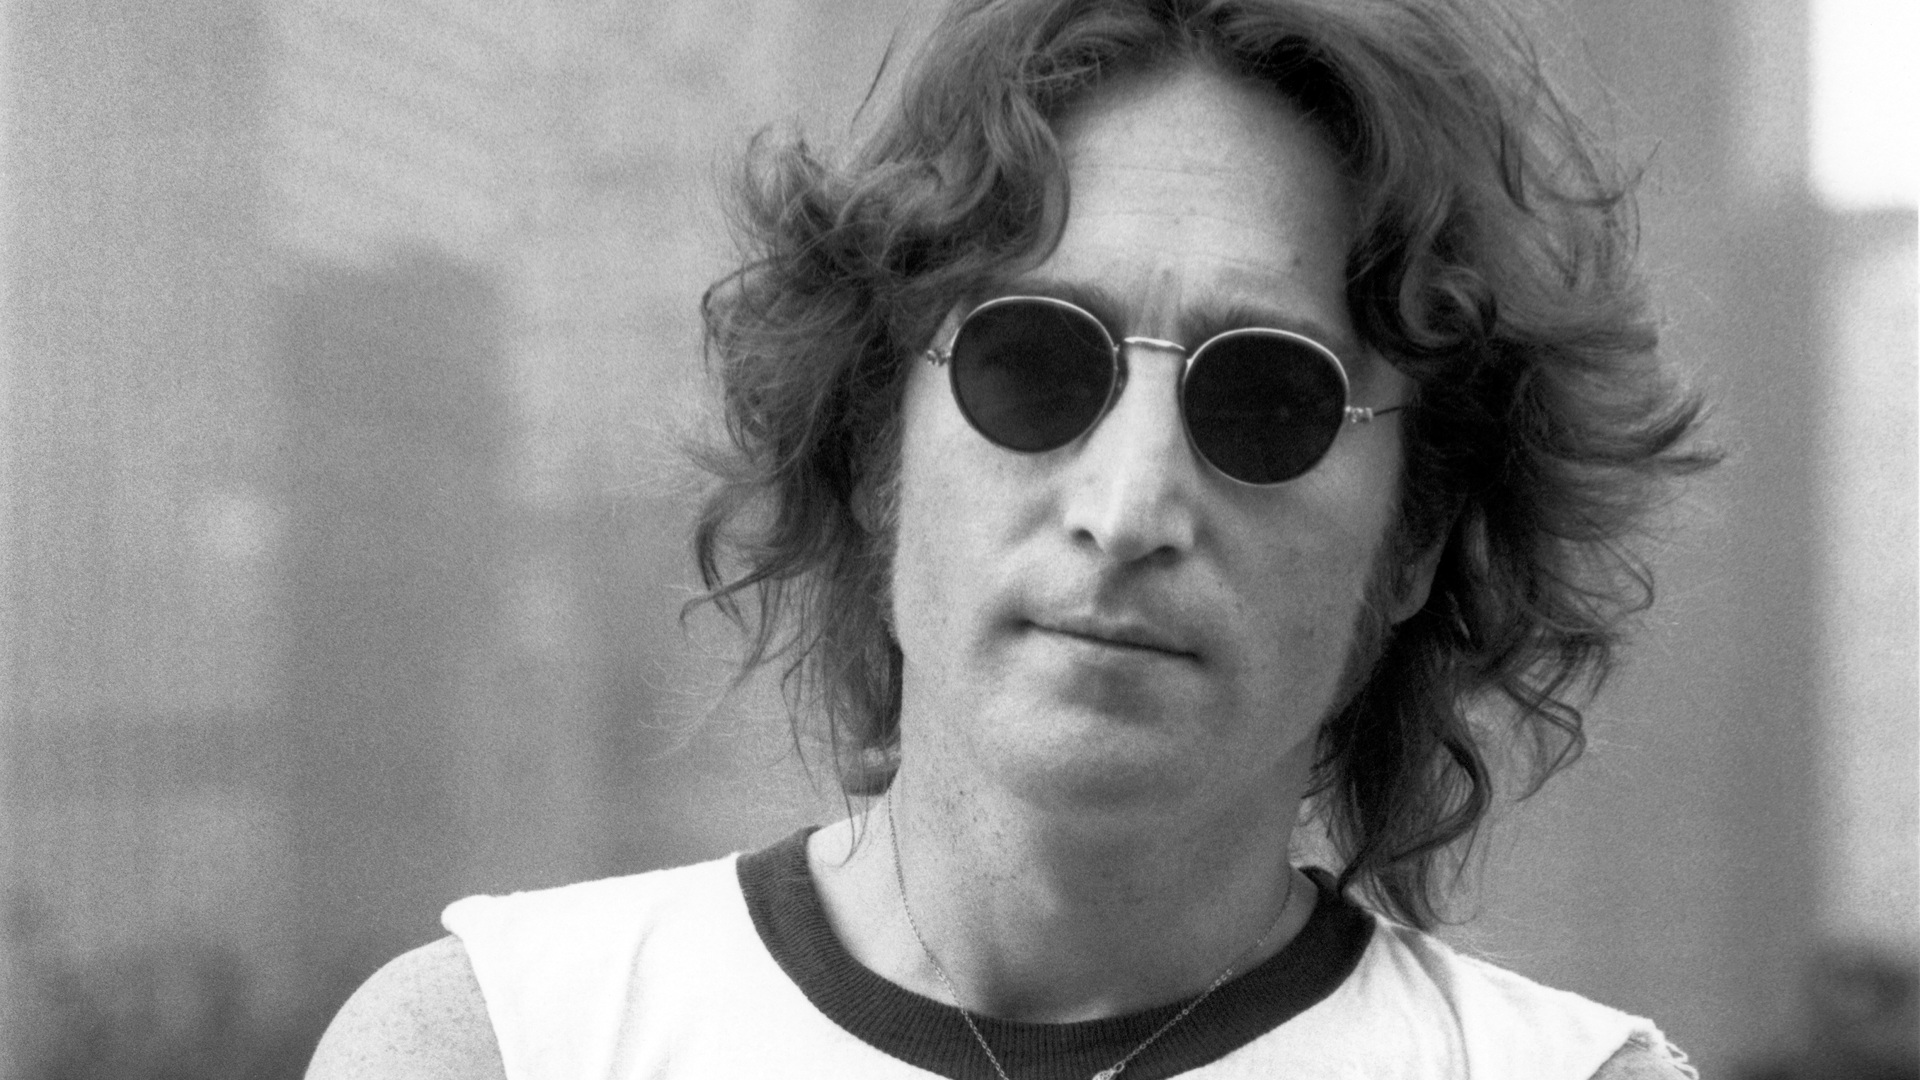 John Lennon | Music fanart | fanart.tv